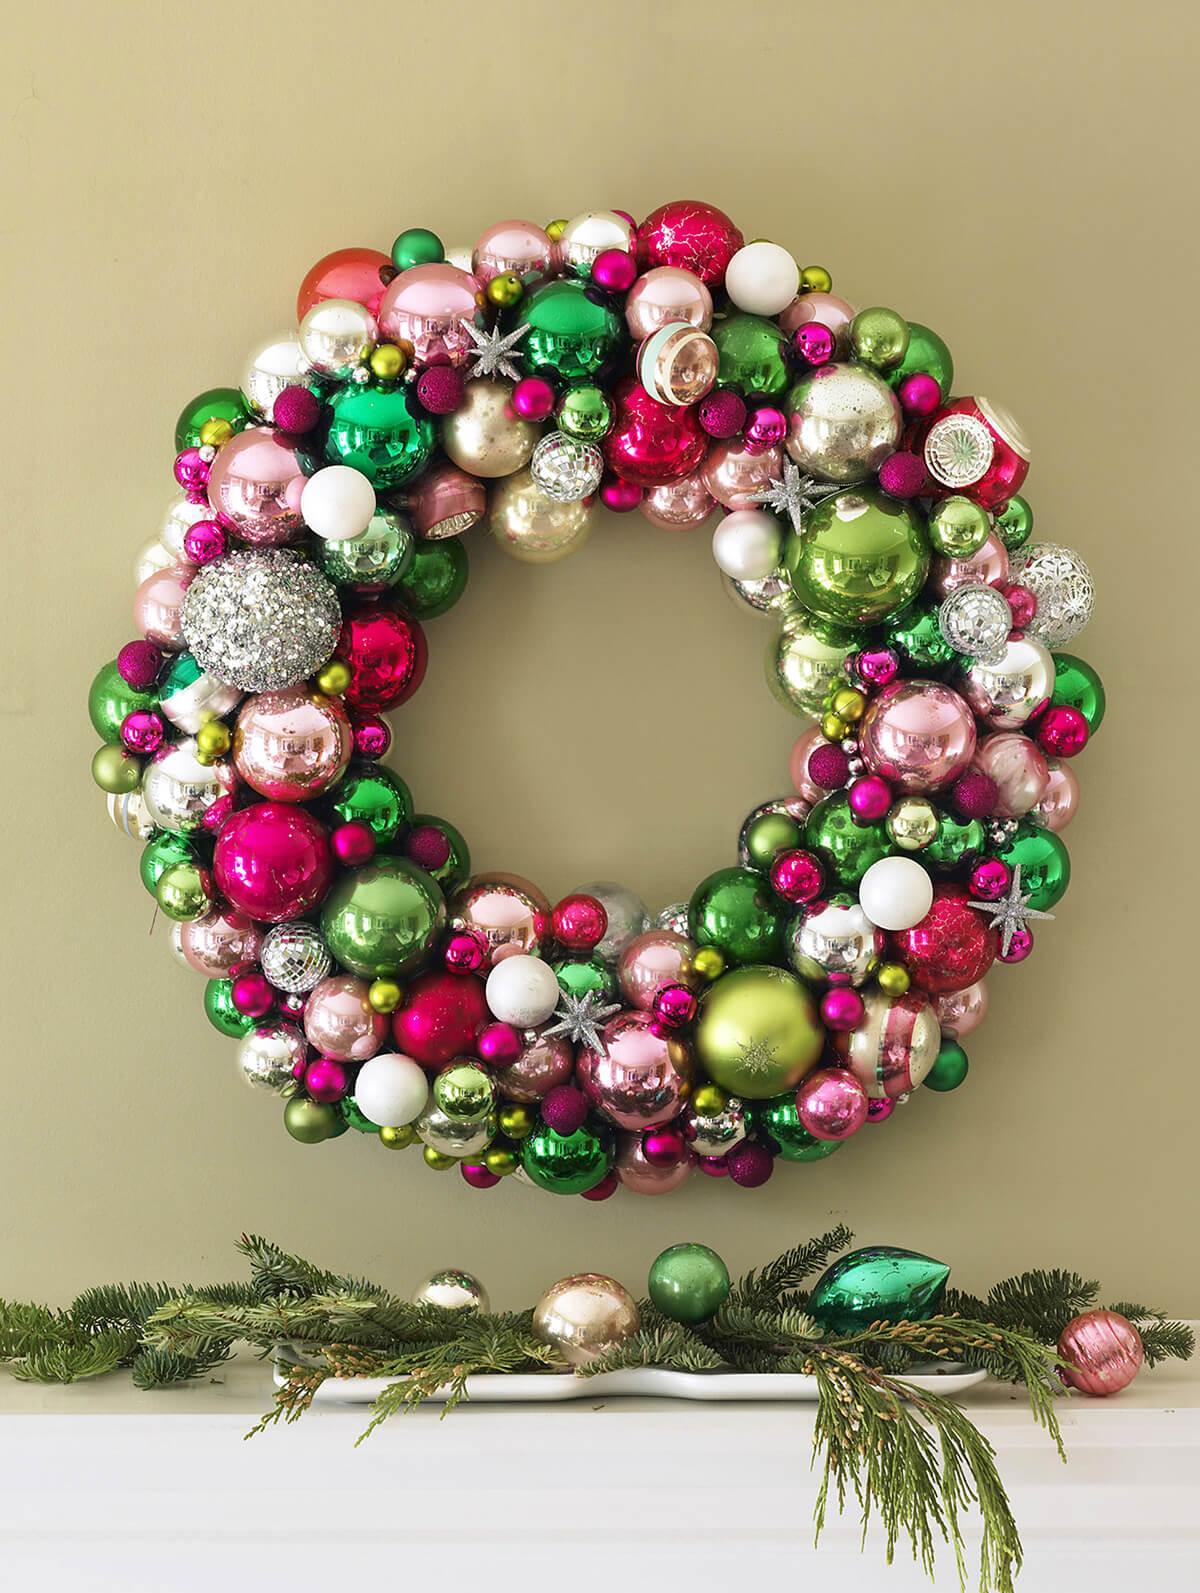 Amazing Mixed Ornament Indoor Wreath